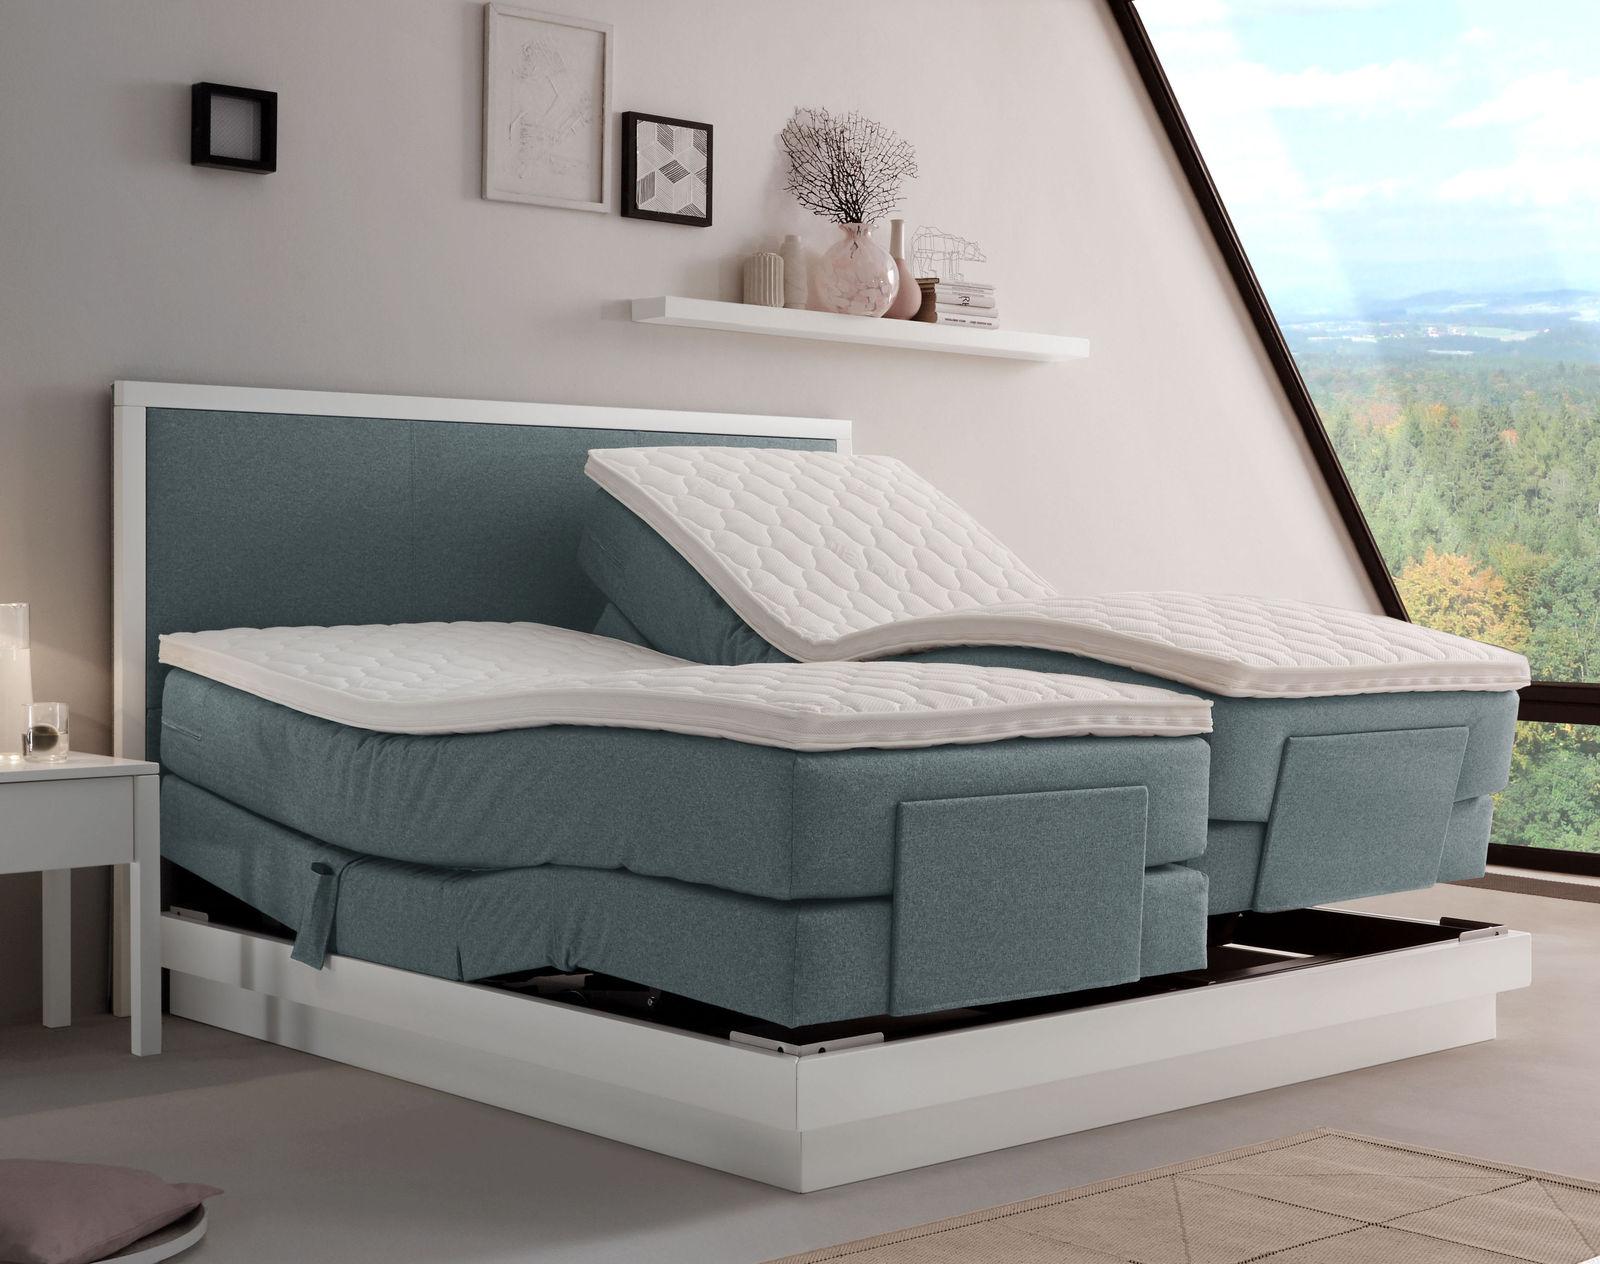 modernes boxspringbett mit motor und wei em buchensockel pando. Black Bedroom Furniture Sets. Home Design Ideas